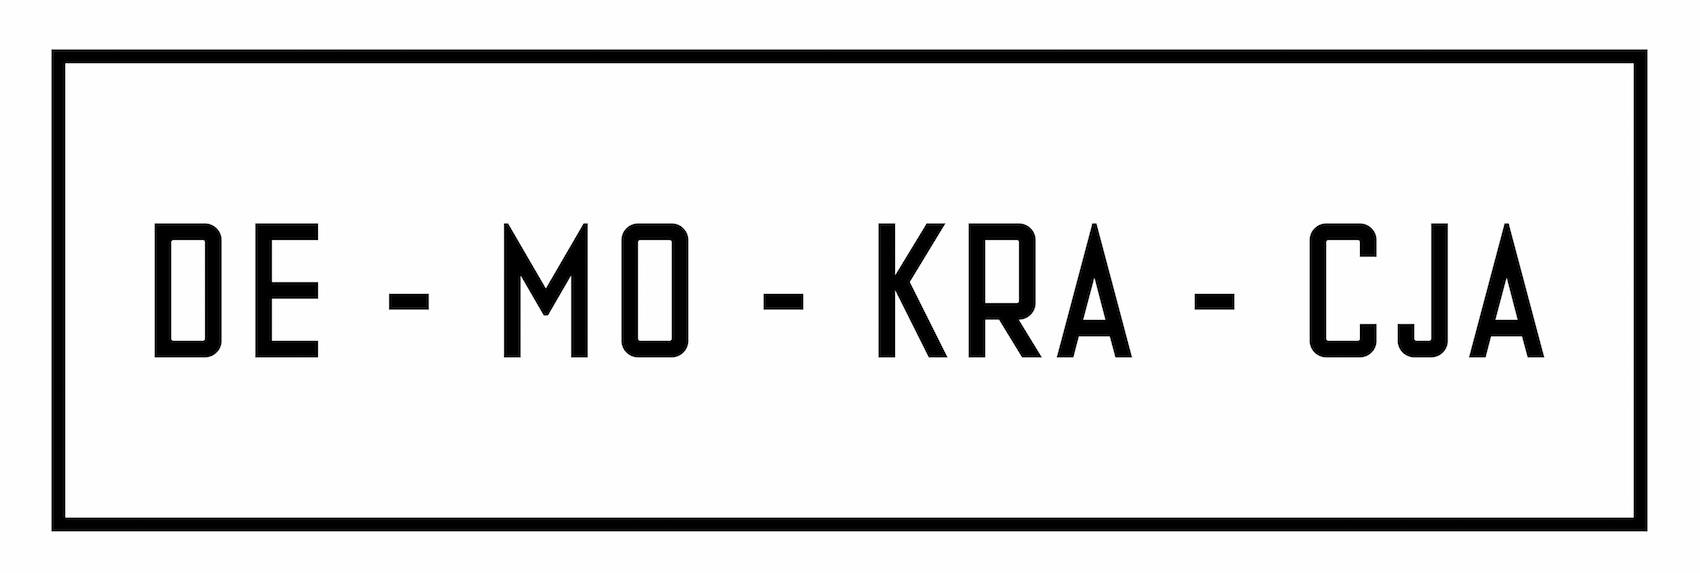 """DE – MO – KRA – CJA "" (źródło: materiały prasowe organizatora)"